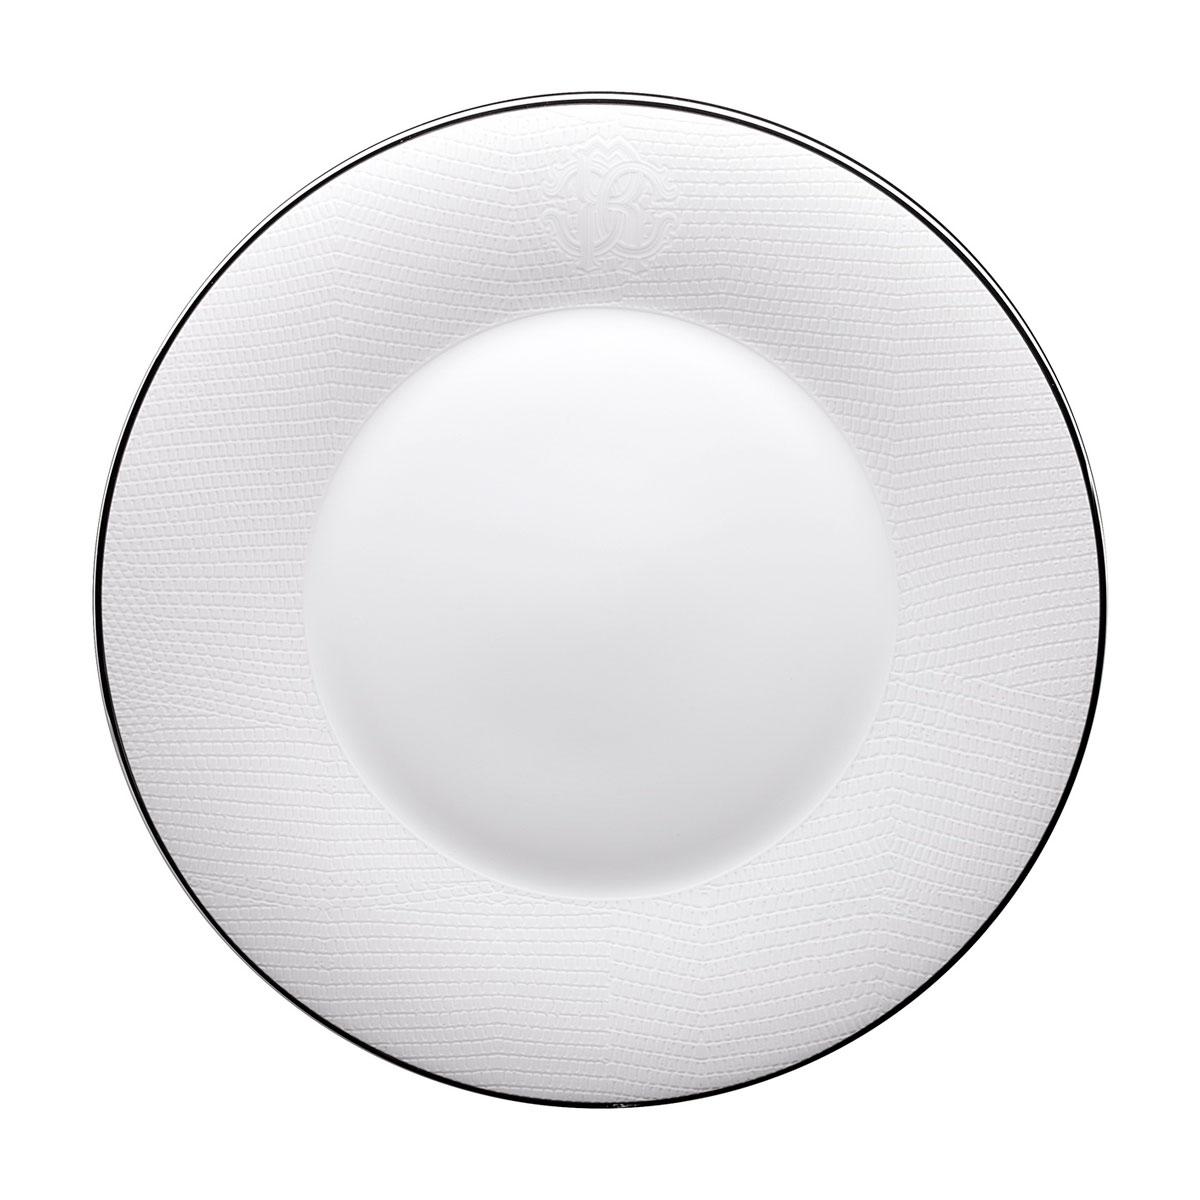 1200x1200 Lizzard Platin Dinner Plate